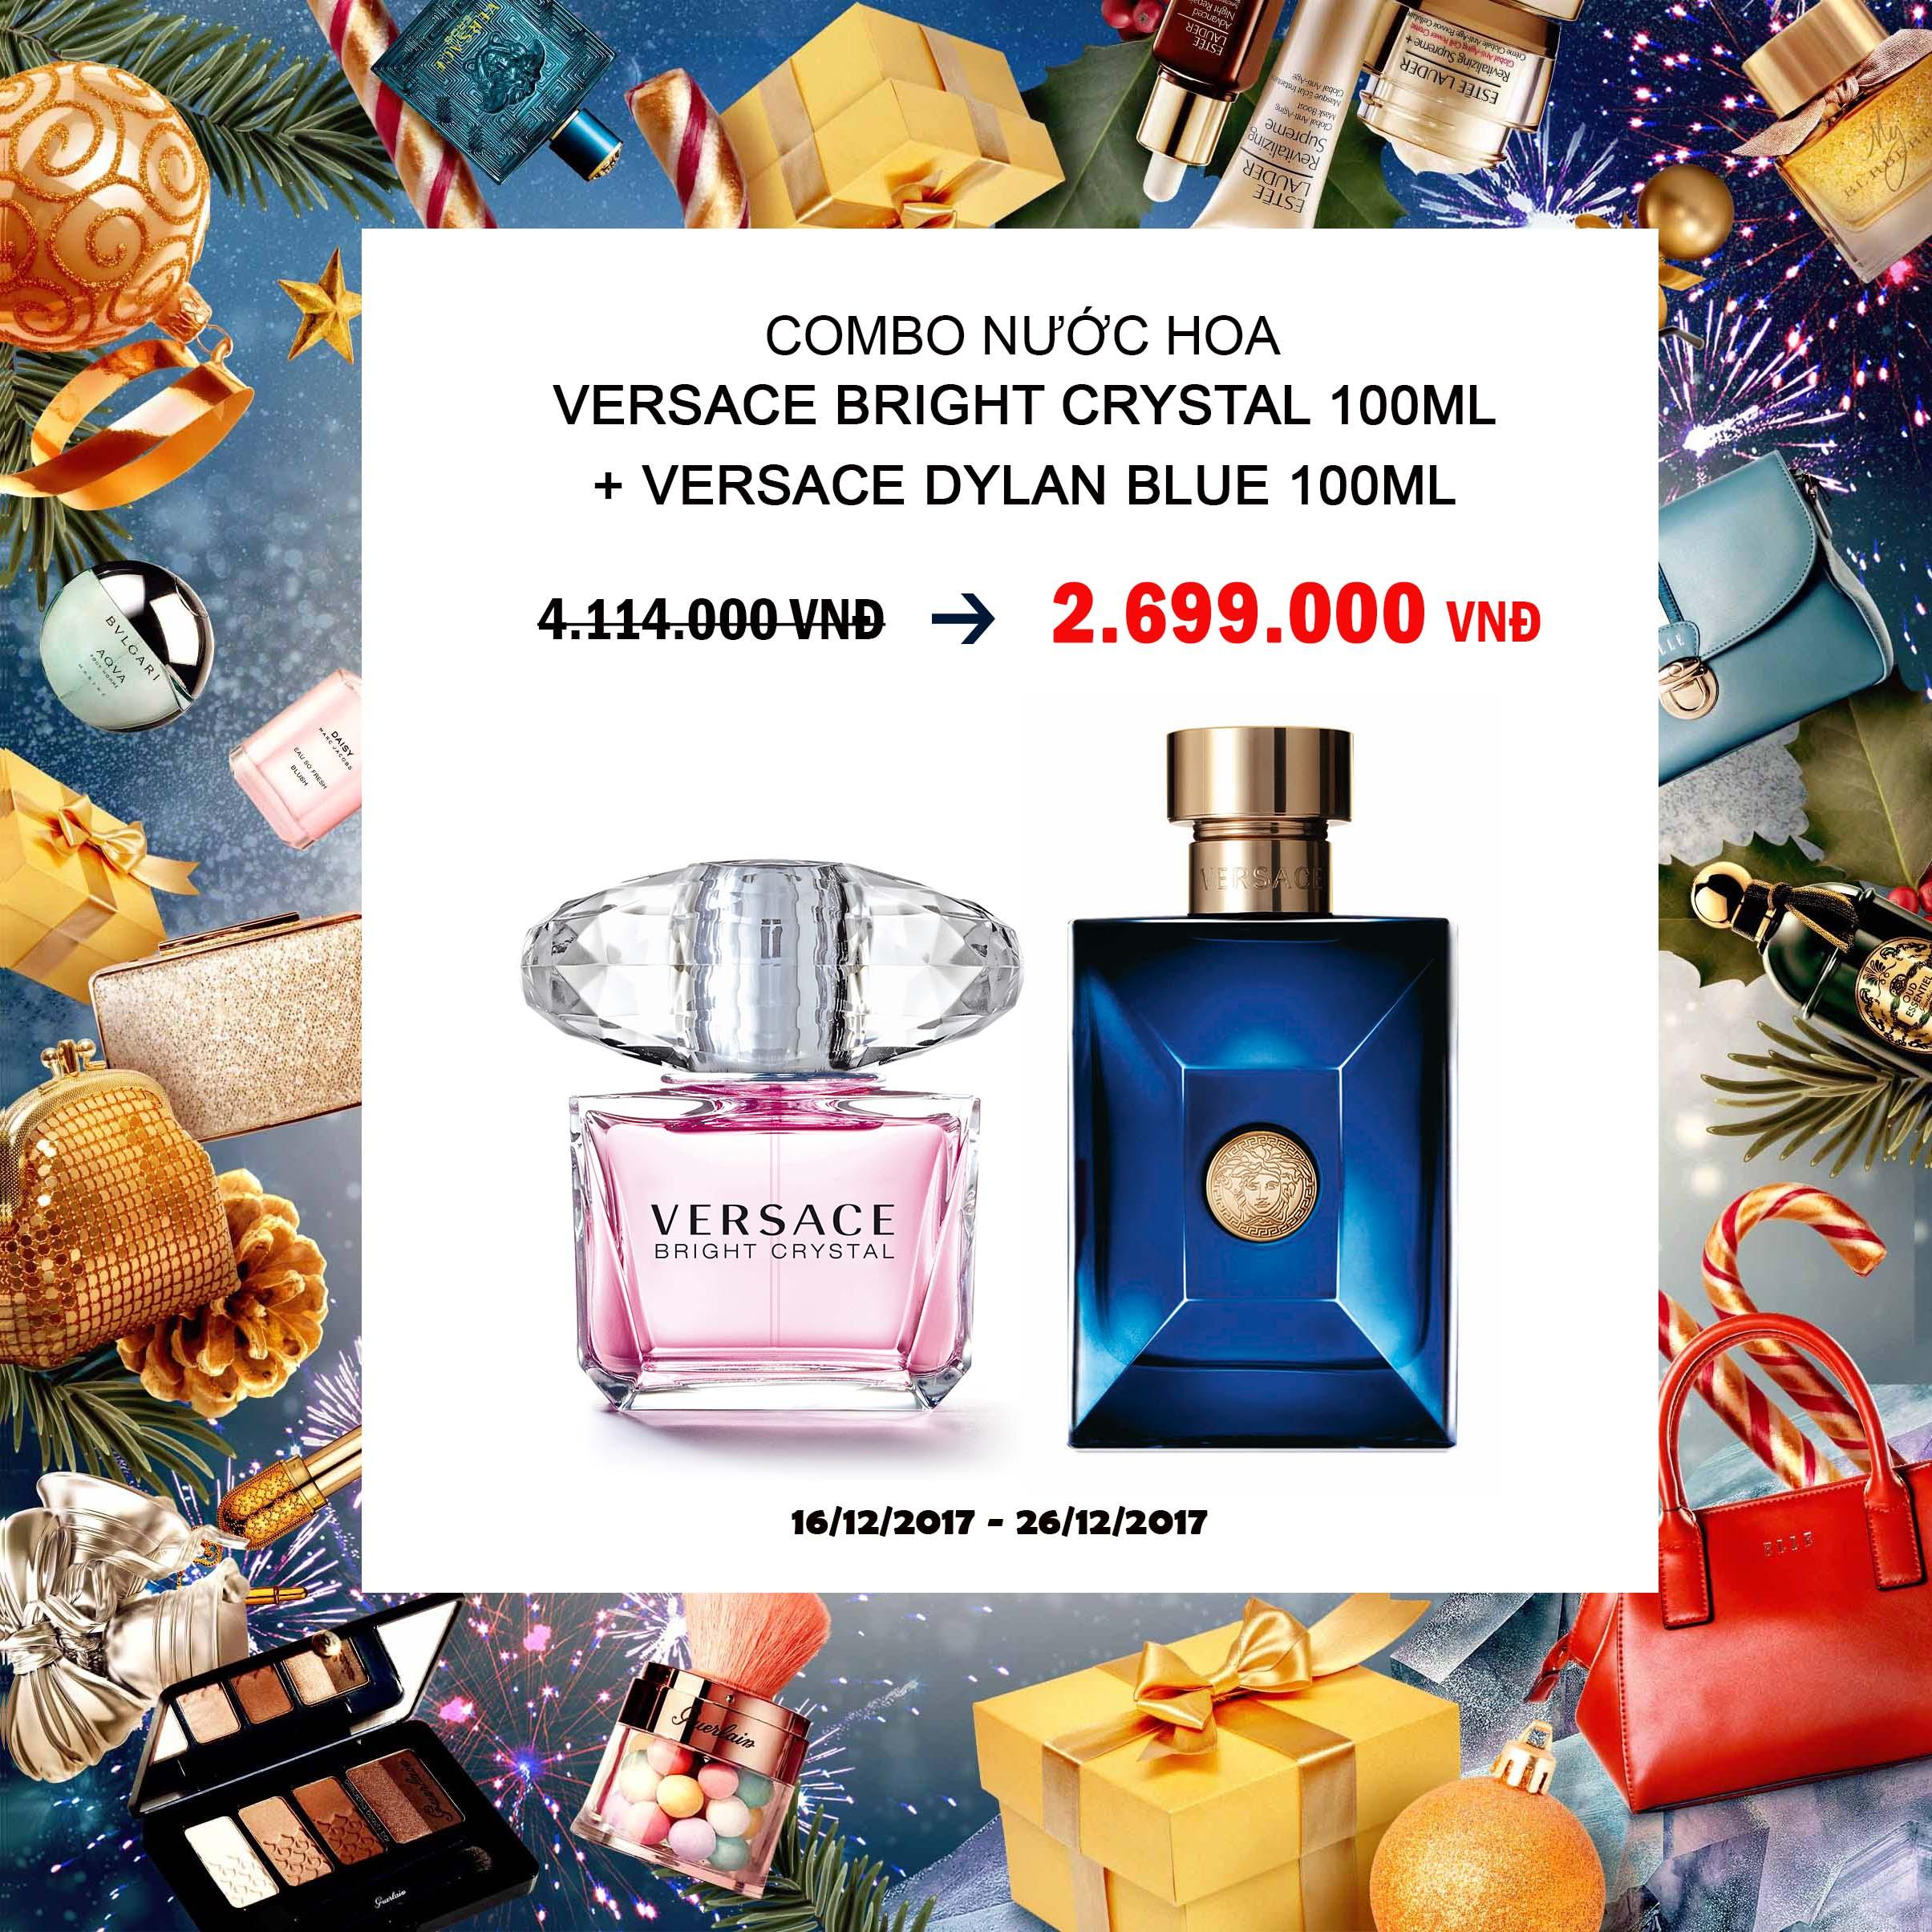 nuoc hoa Versace/Salvatore Ferragamo 02